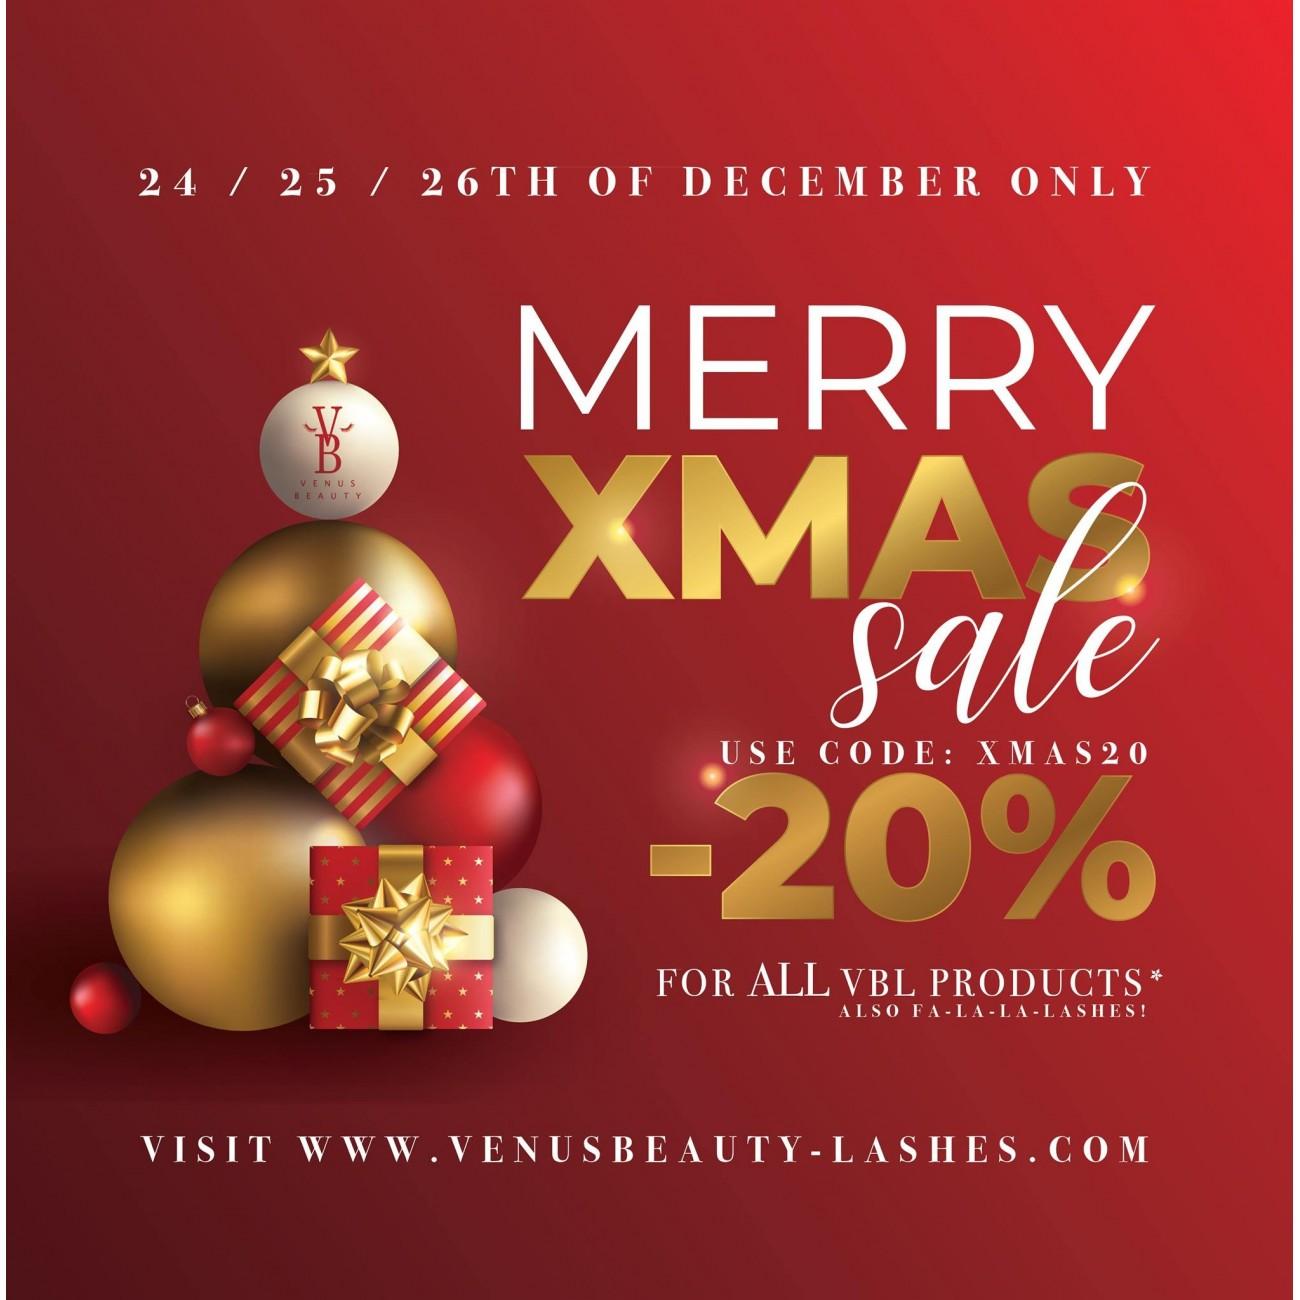 Merry Xmas Sale